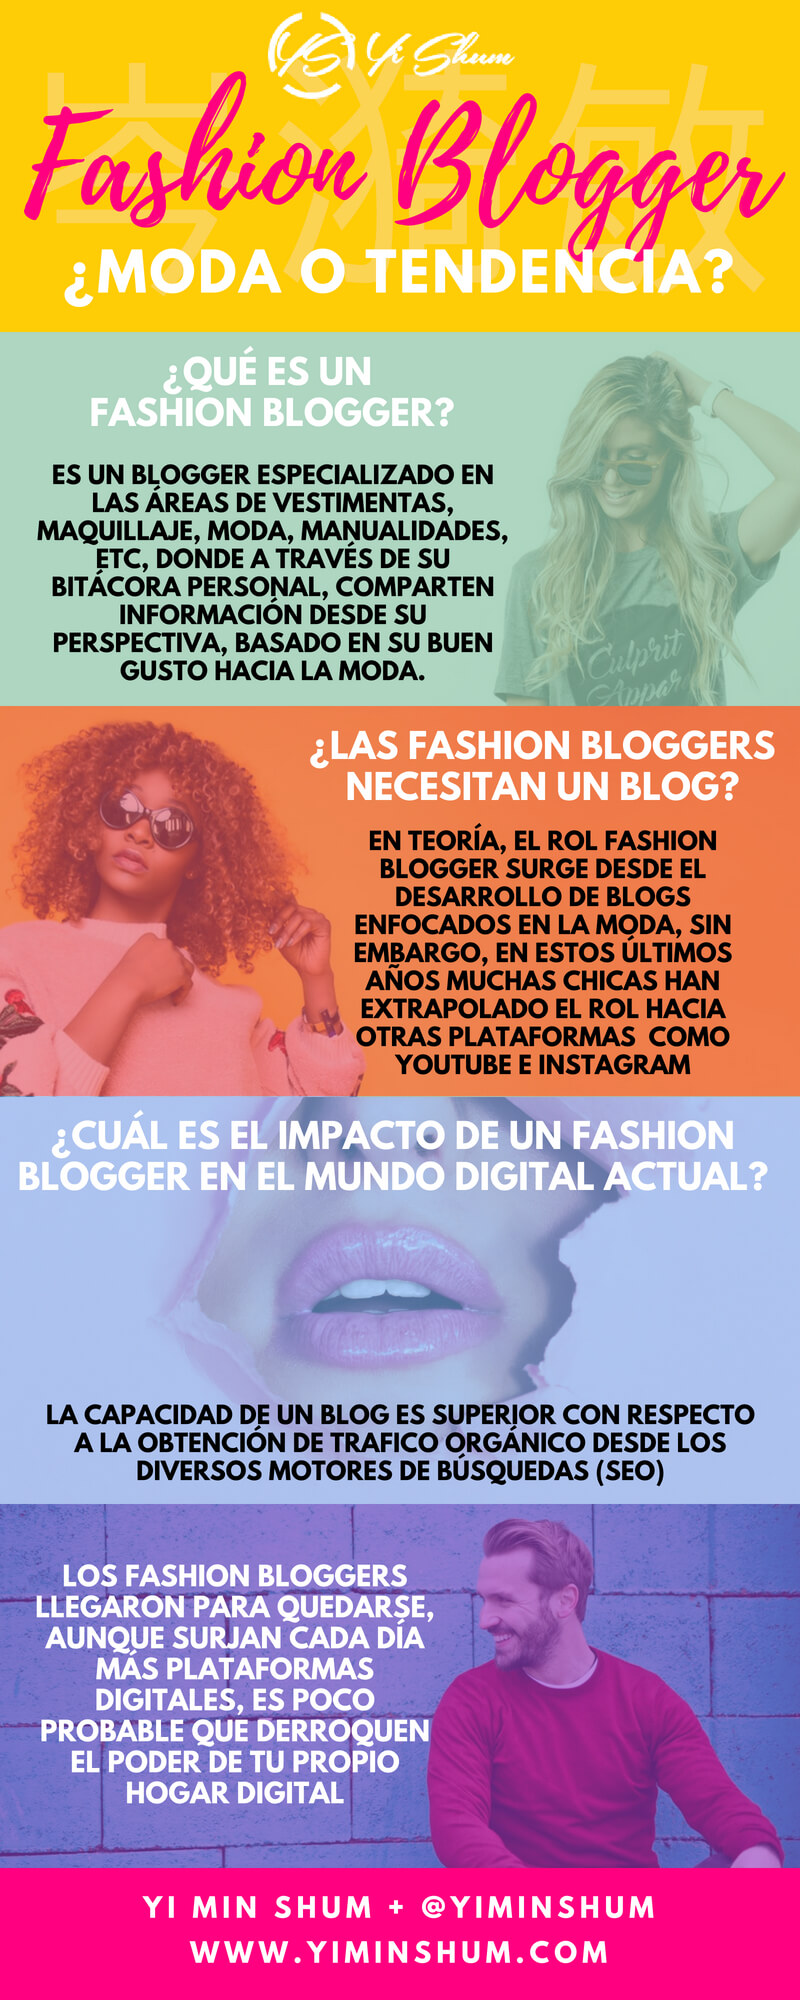 Fashion bloggers ¿moda o tendencia?